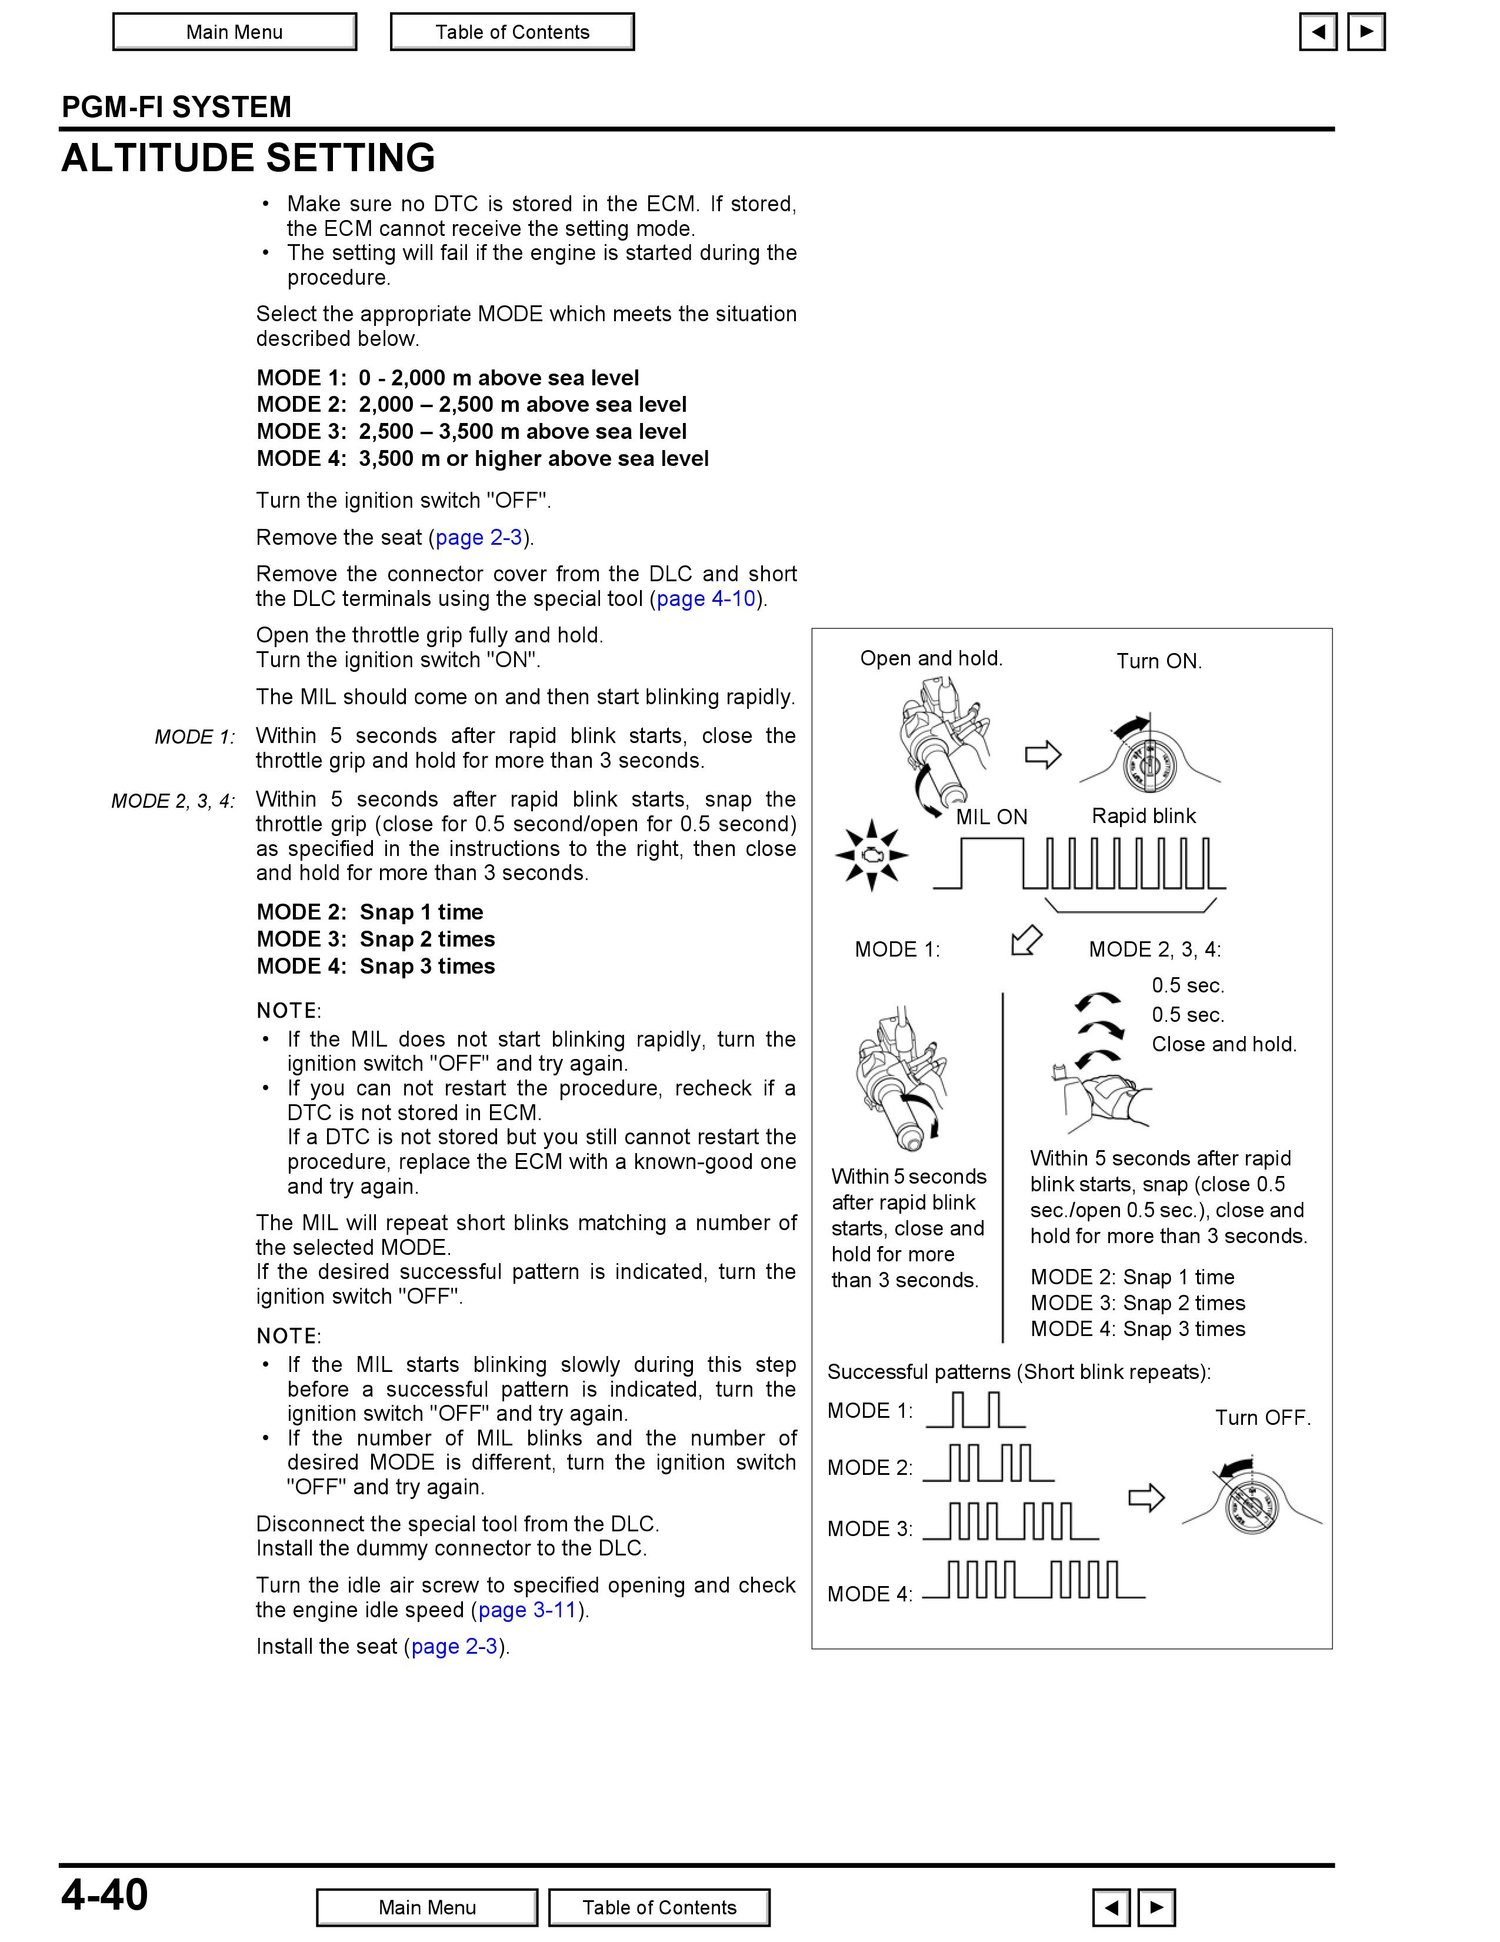 CJR Performance - CameronJonesRaacing.comCJR Performance - CameronJonesRaacing.com